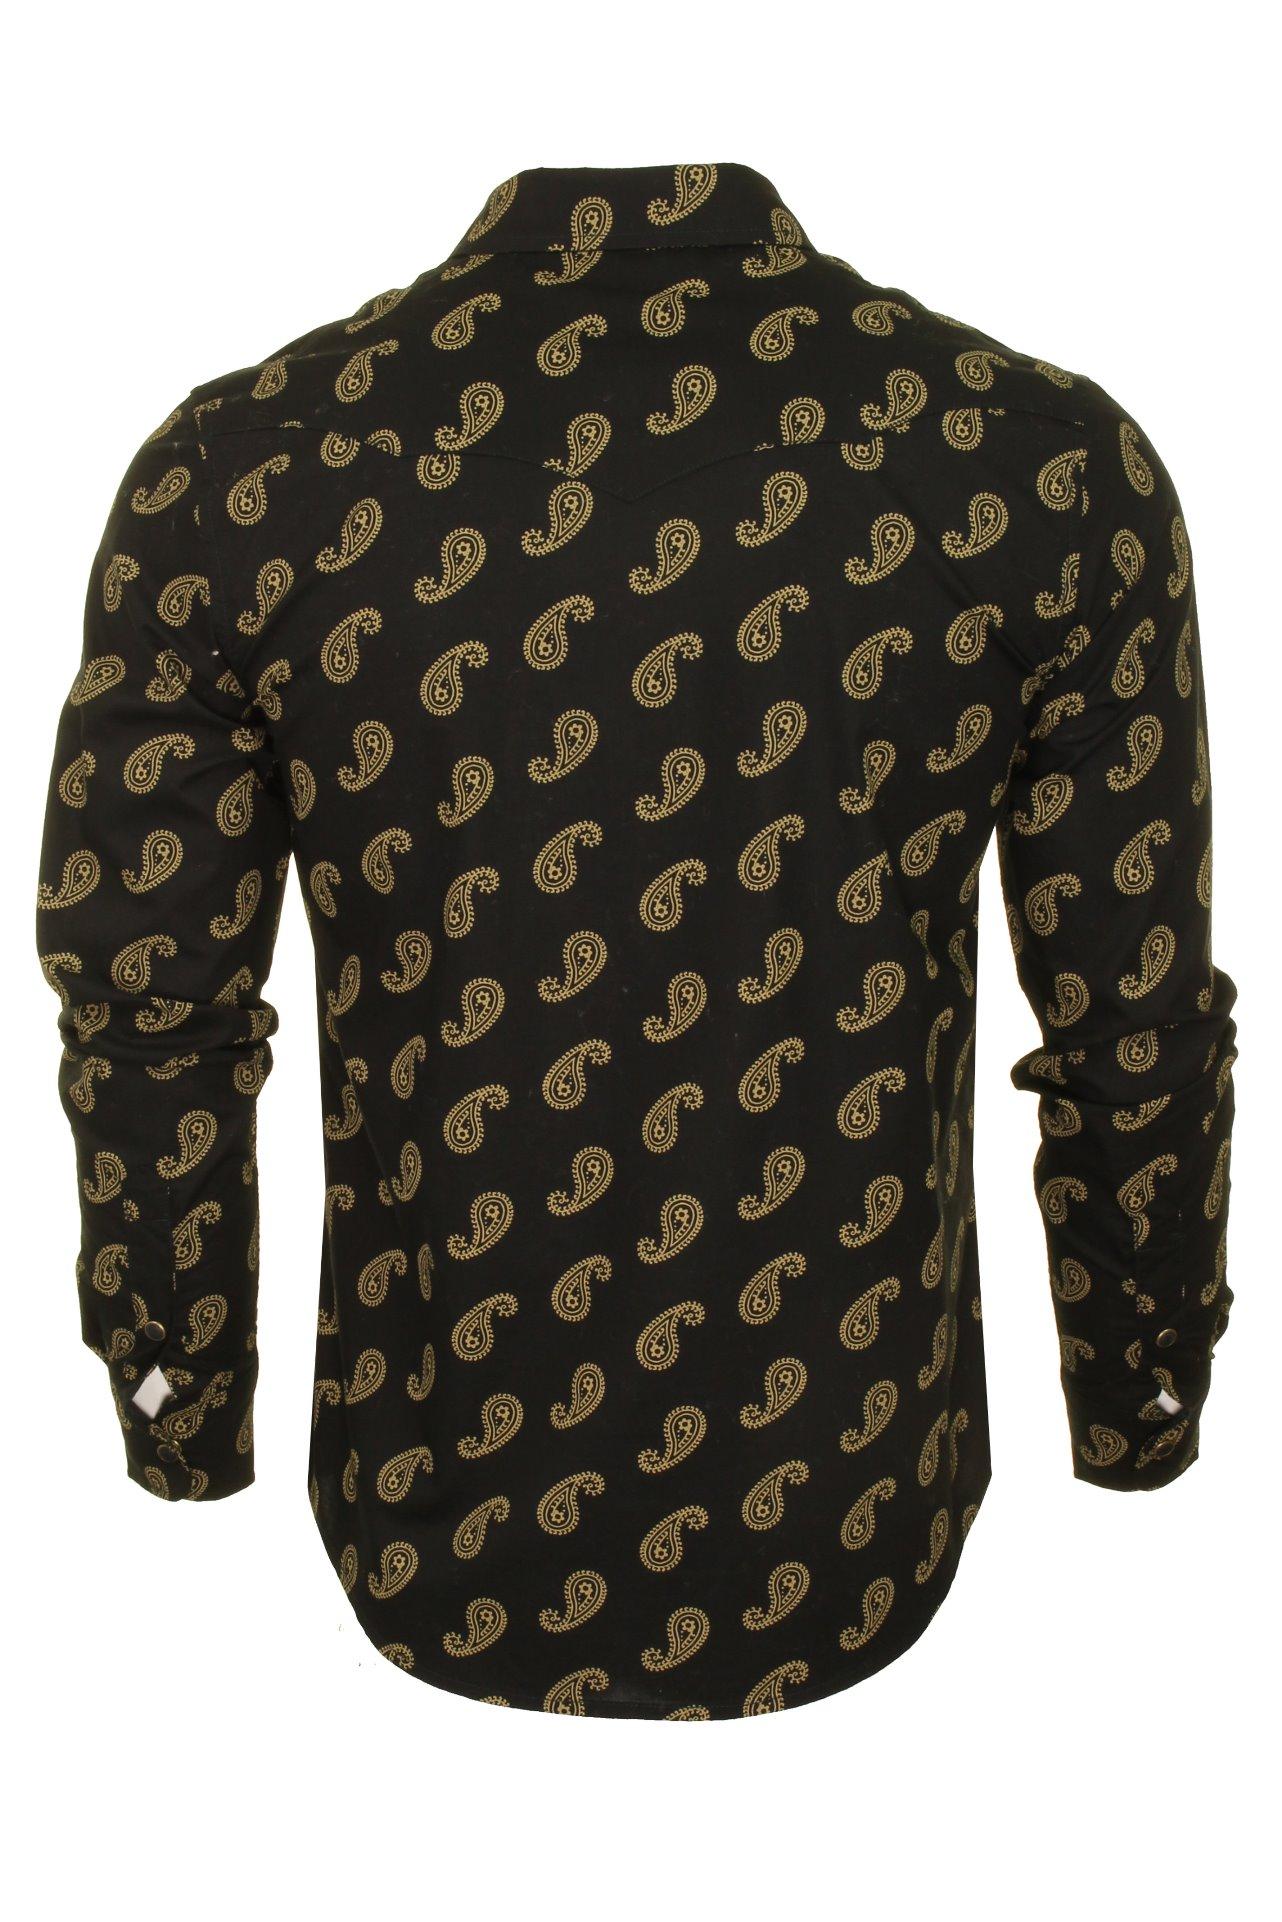 8164a98f Mens-Wrangler-Paisley-Western-Shirt thumbnail 4